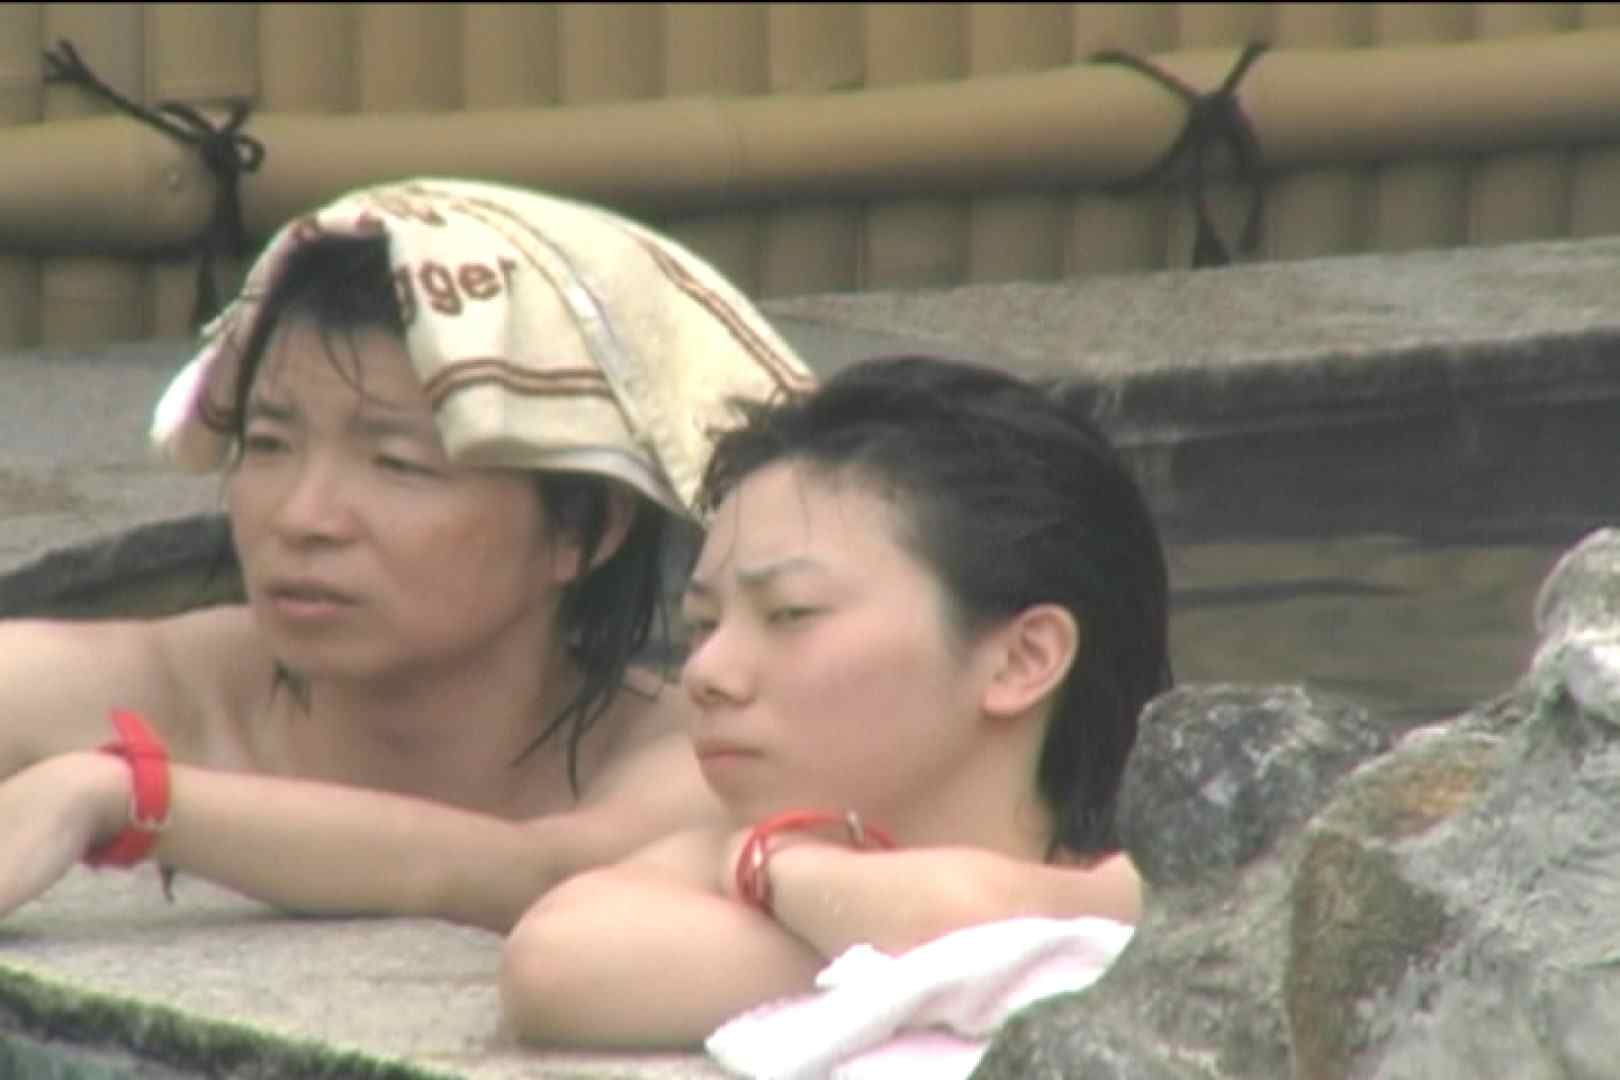 Aquaな露天風呂Vol.122 エッチな盗撮 オメコ無修正動画無料 107pic 2